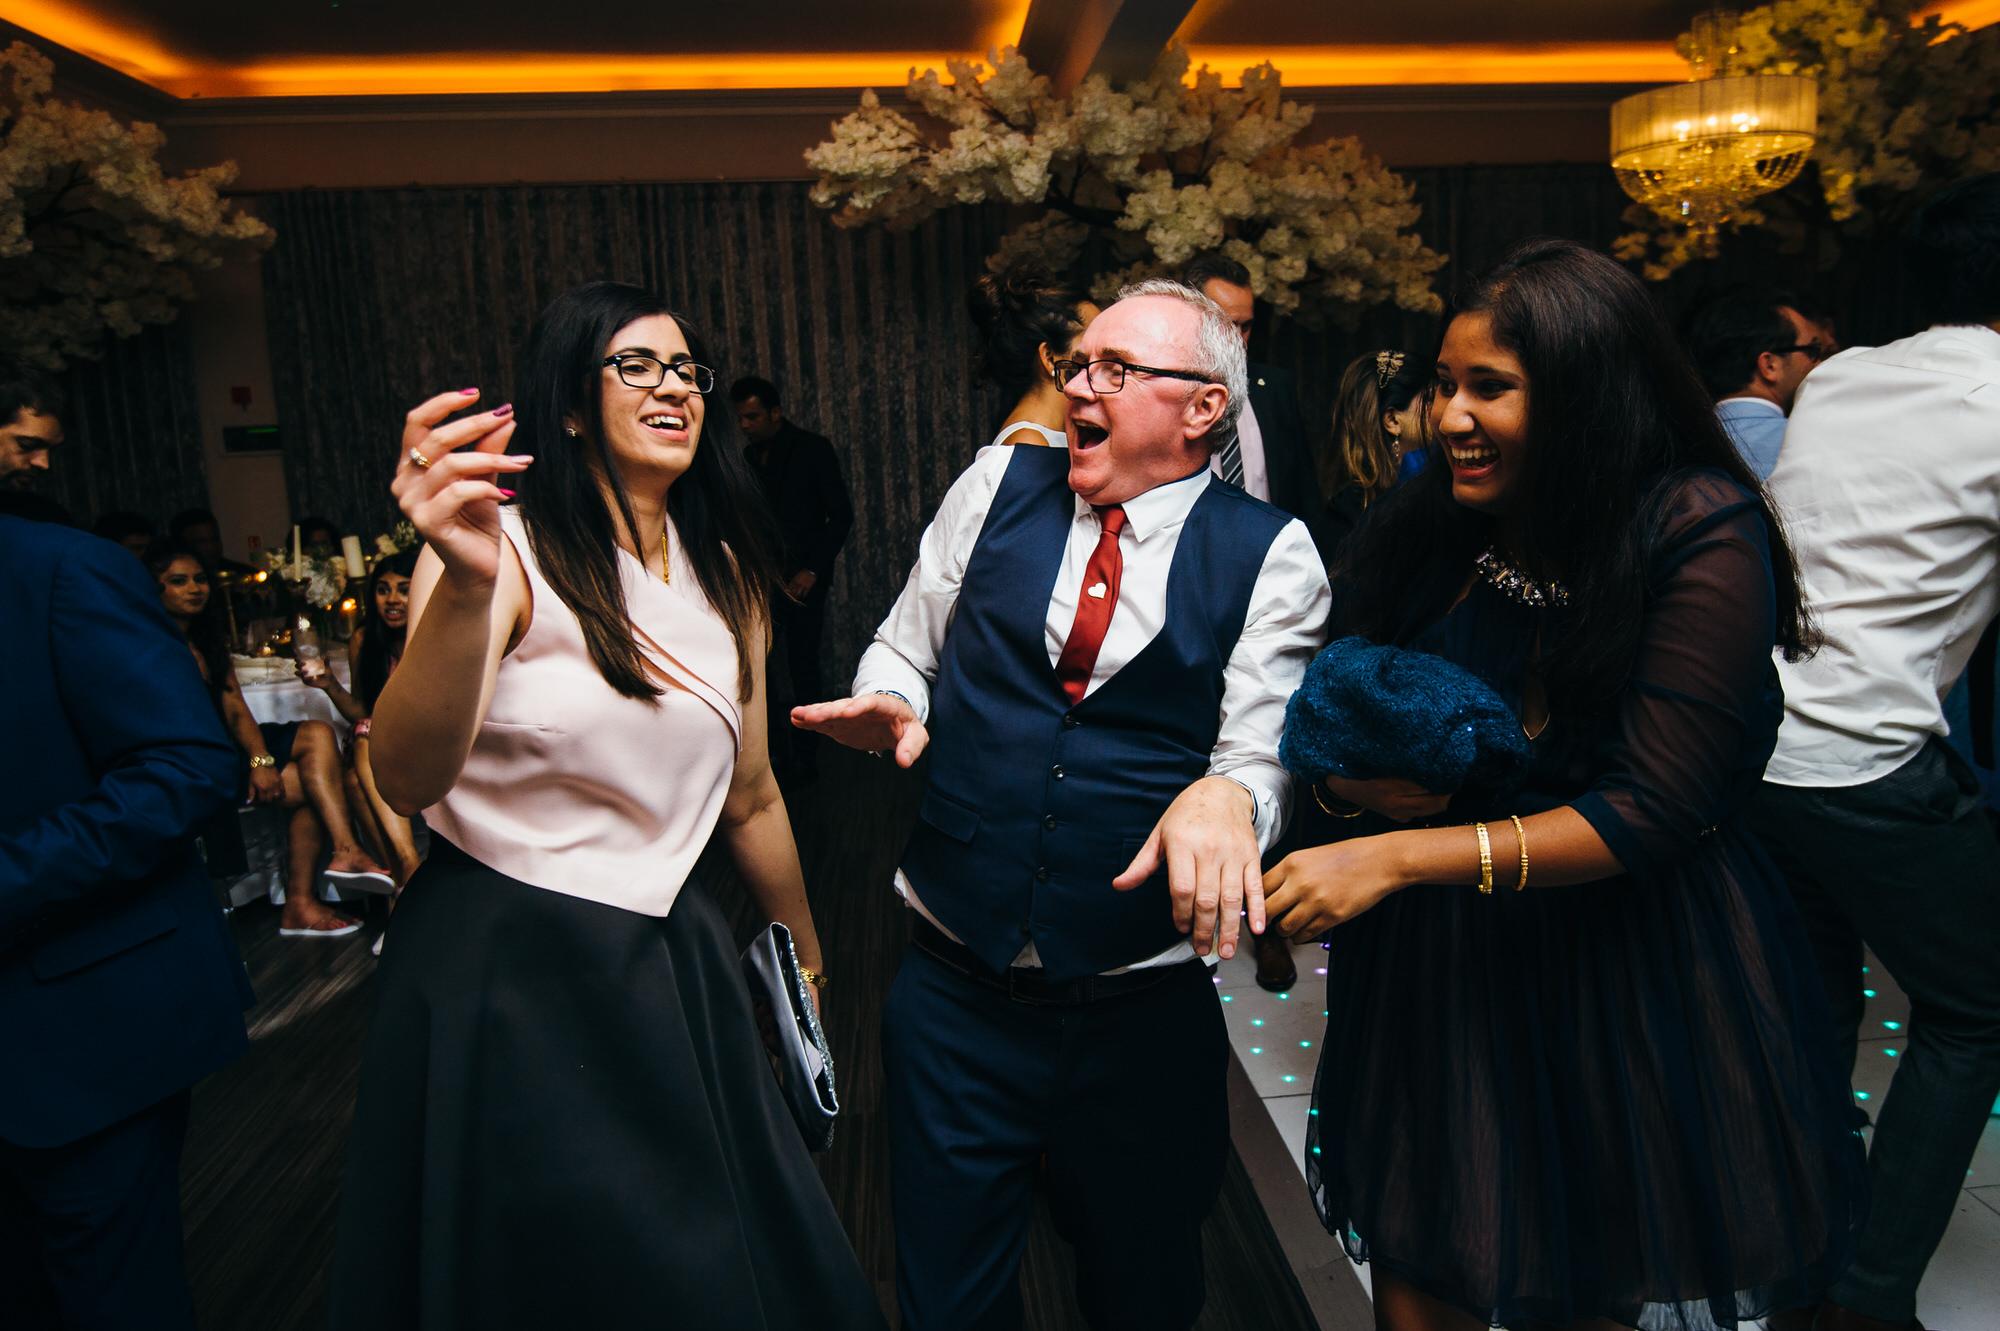 Merrydale manor wedding photography 102